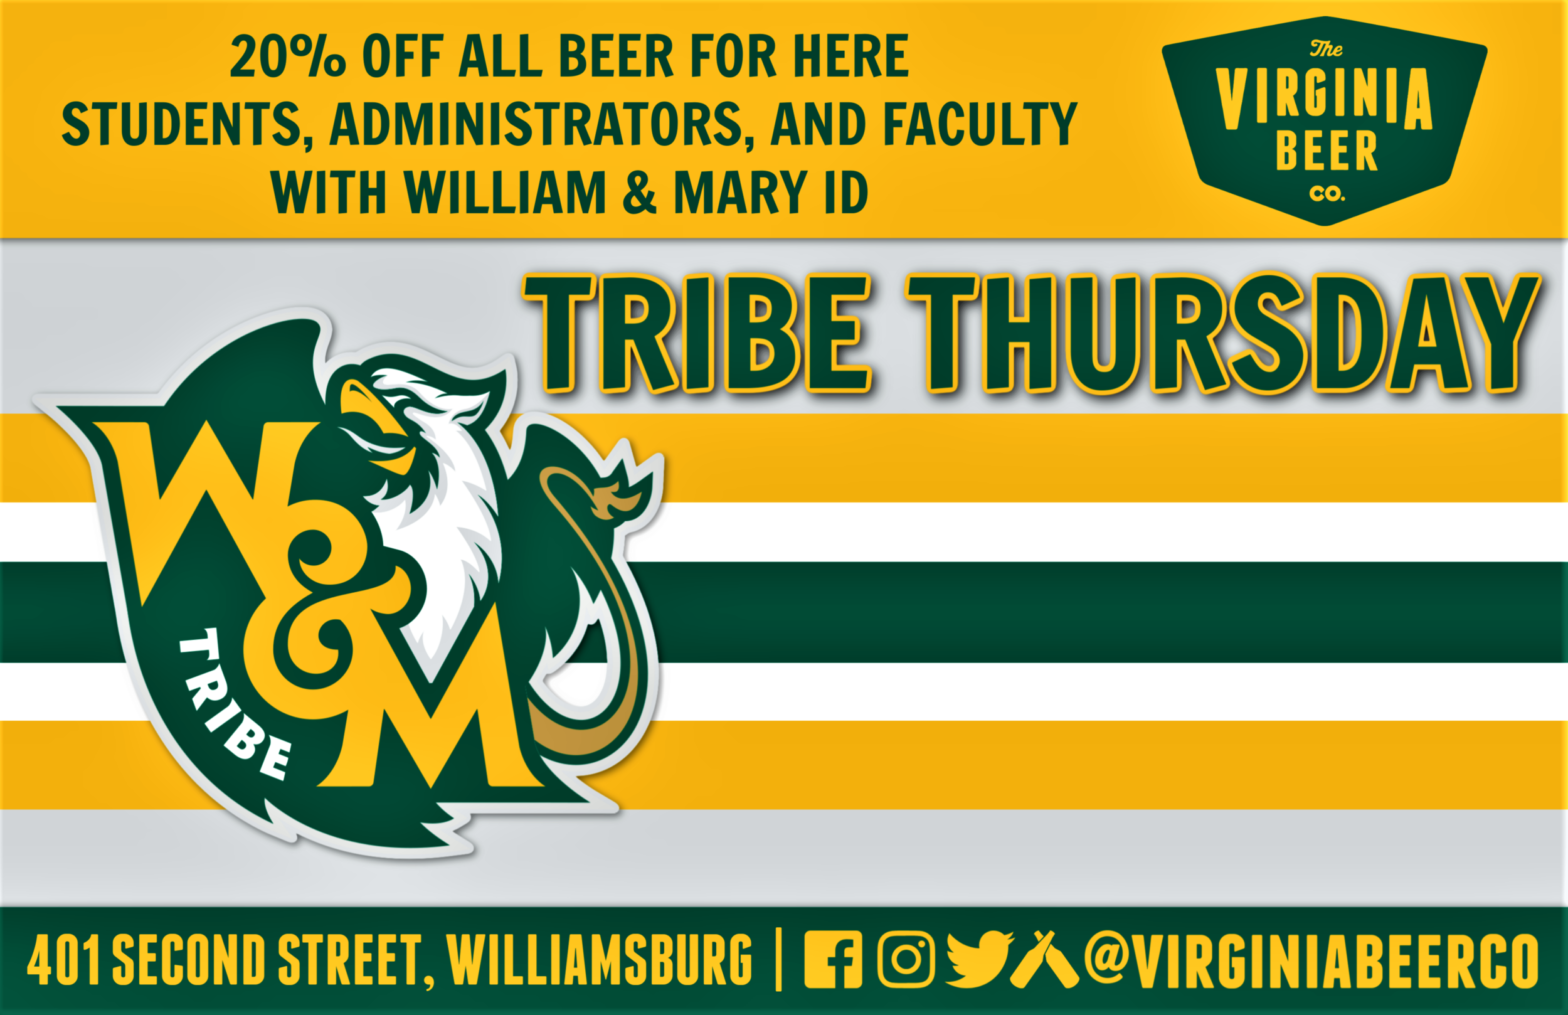 Tribe Thursday Promotion